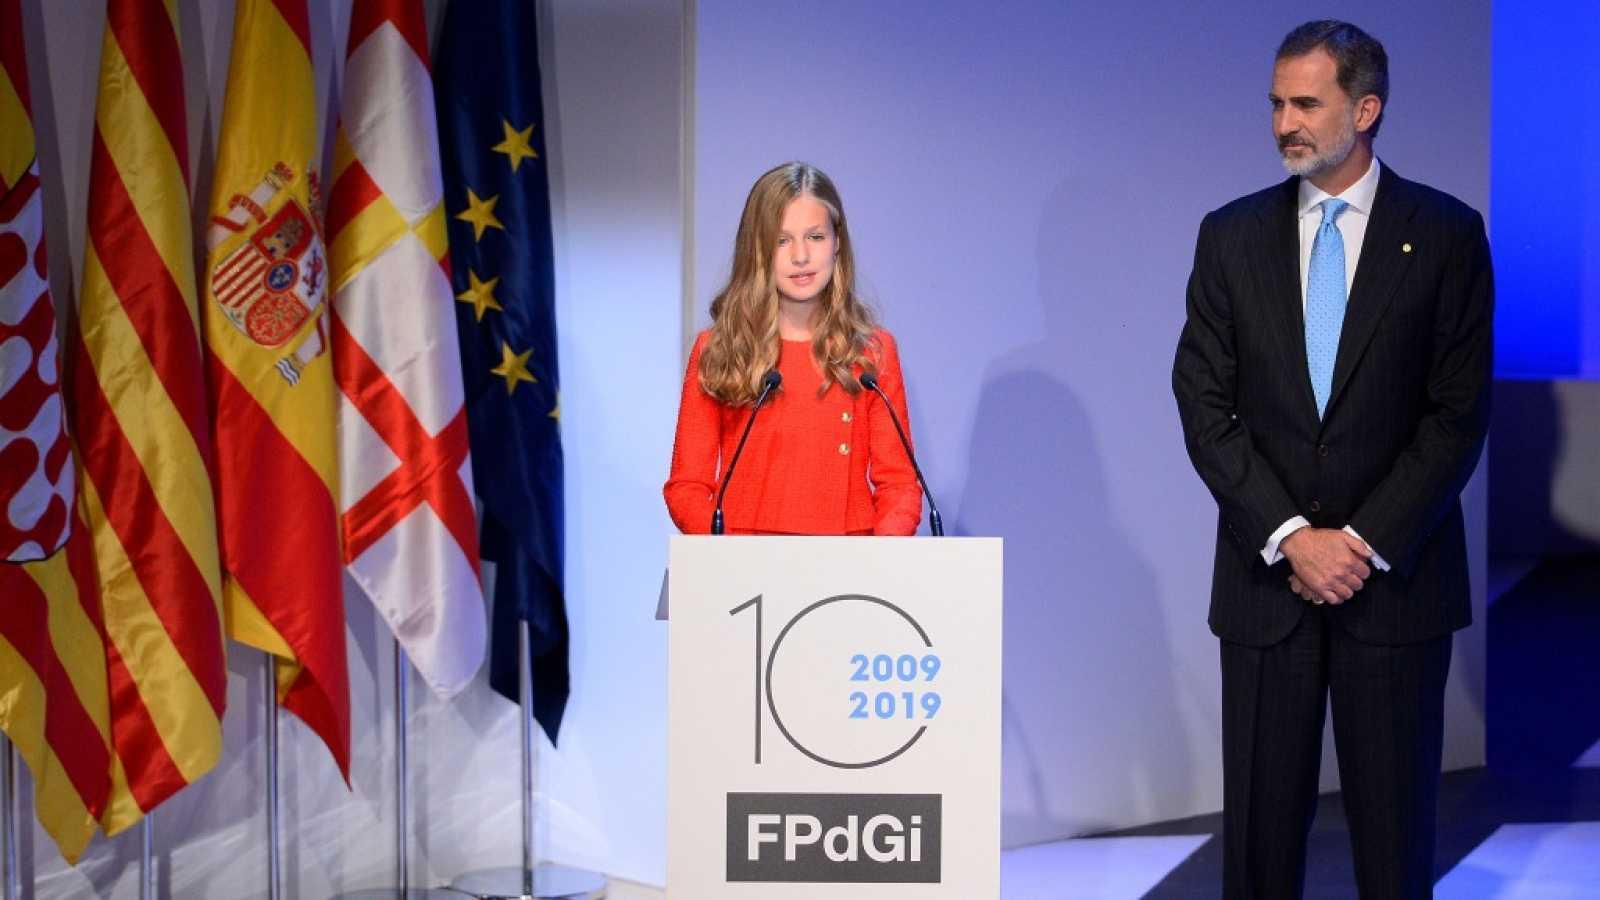 Otros programas - Entrega Premios Princesa de Girona 2019 - ver ahora